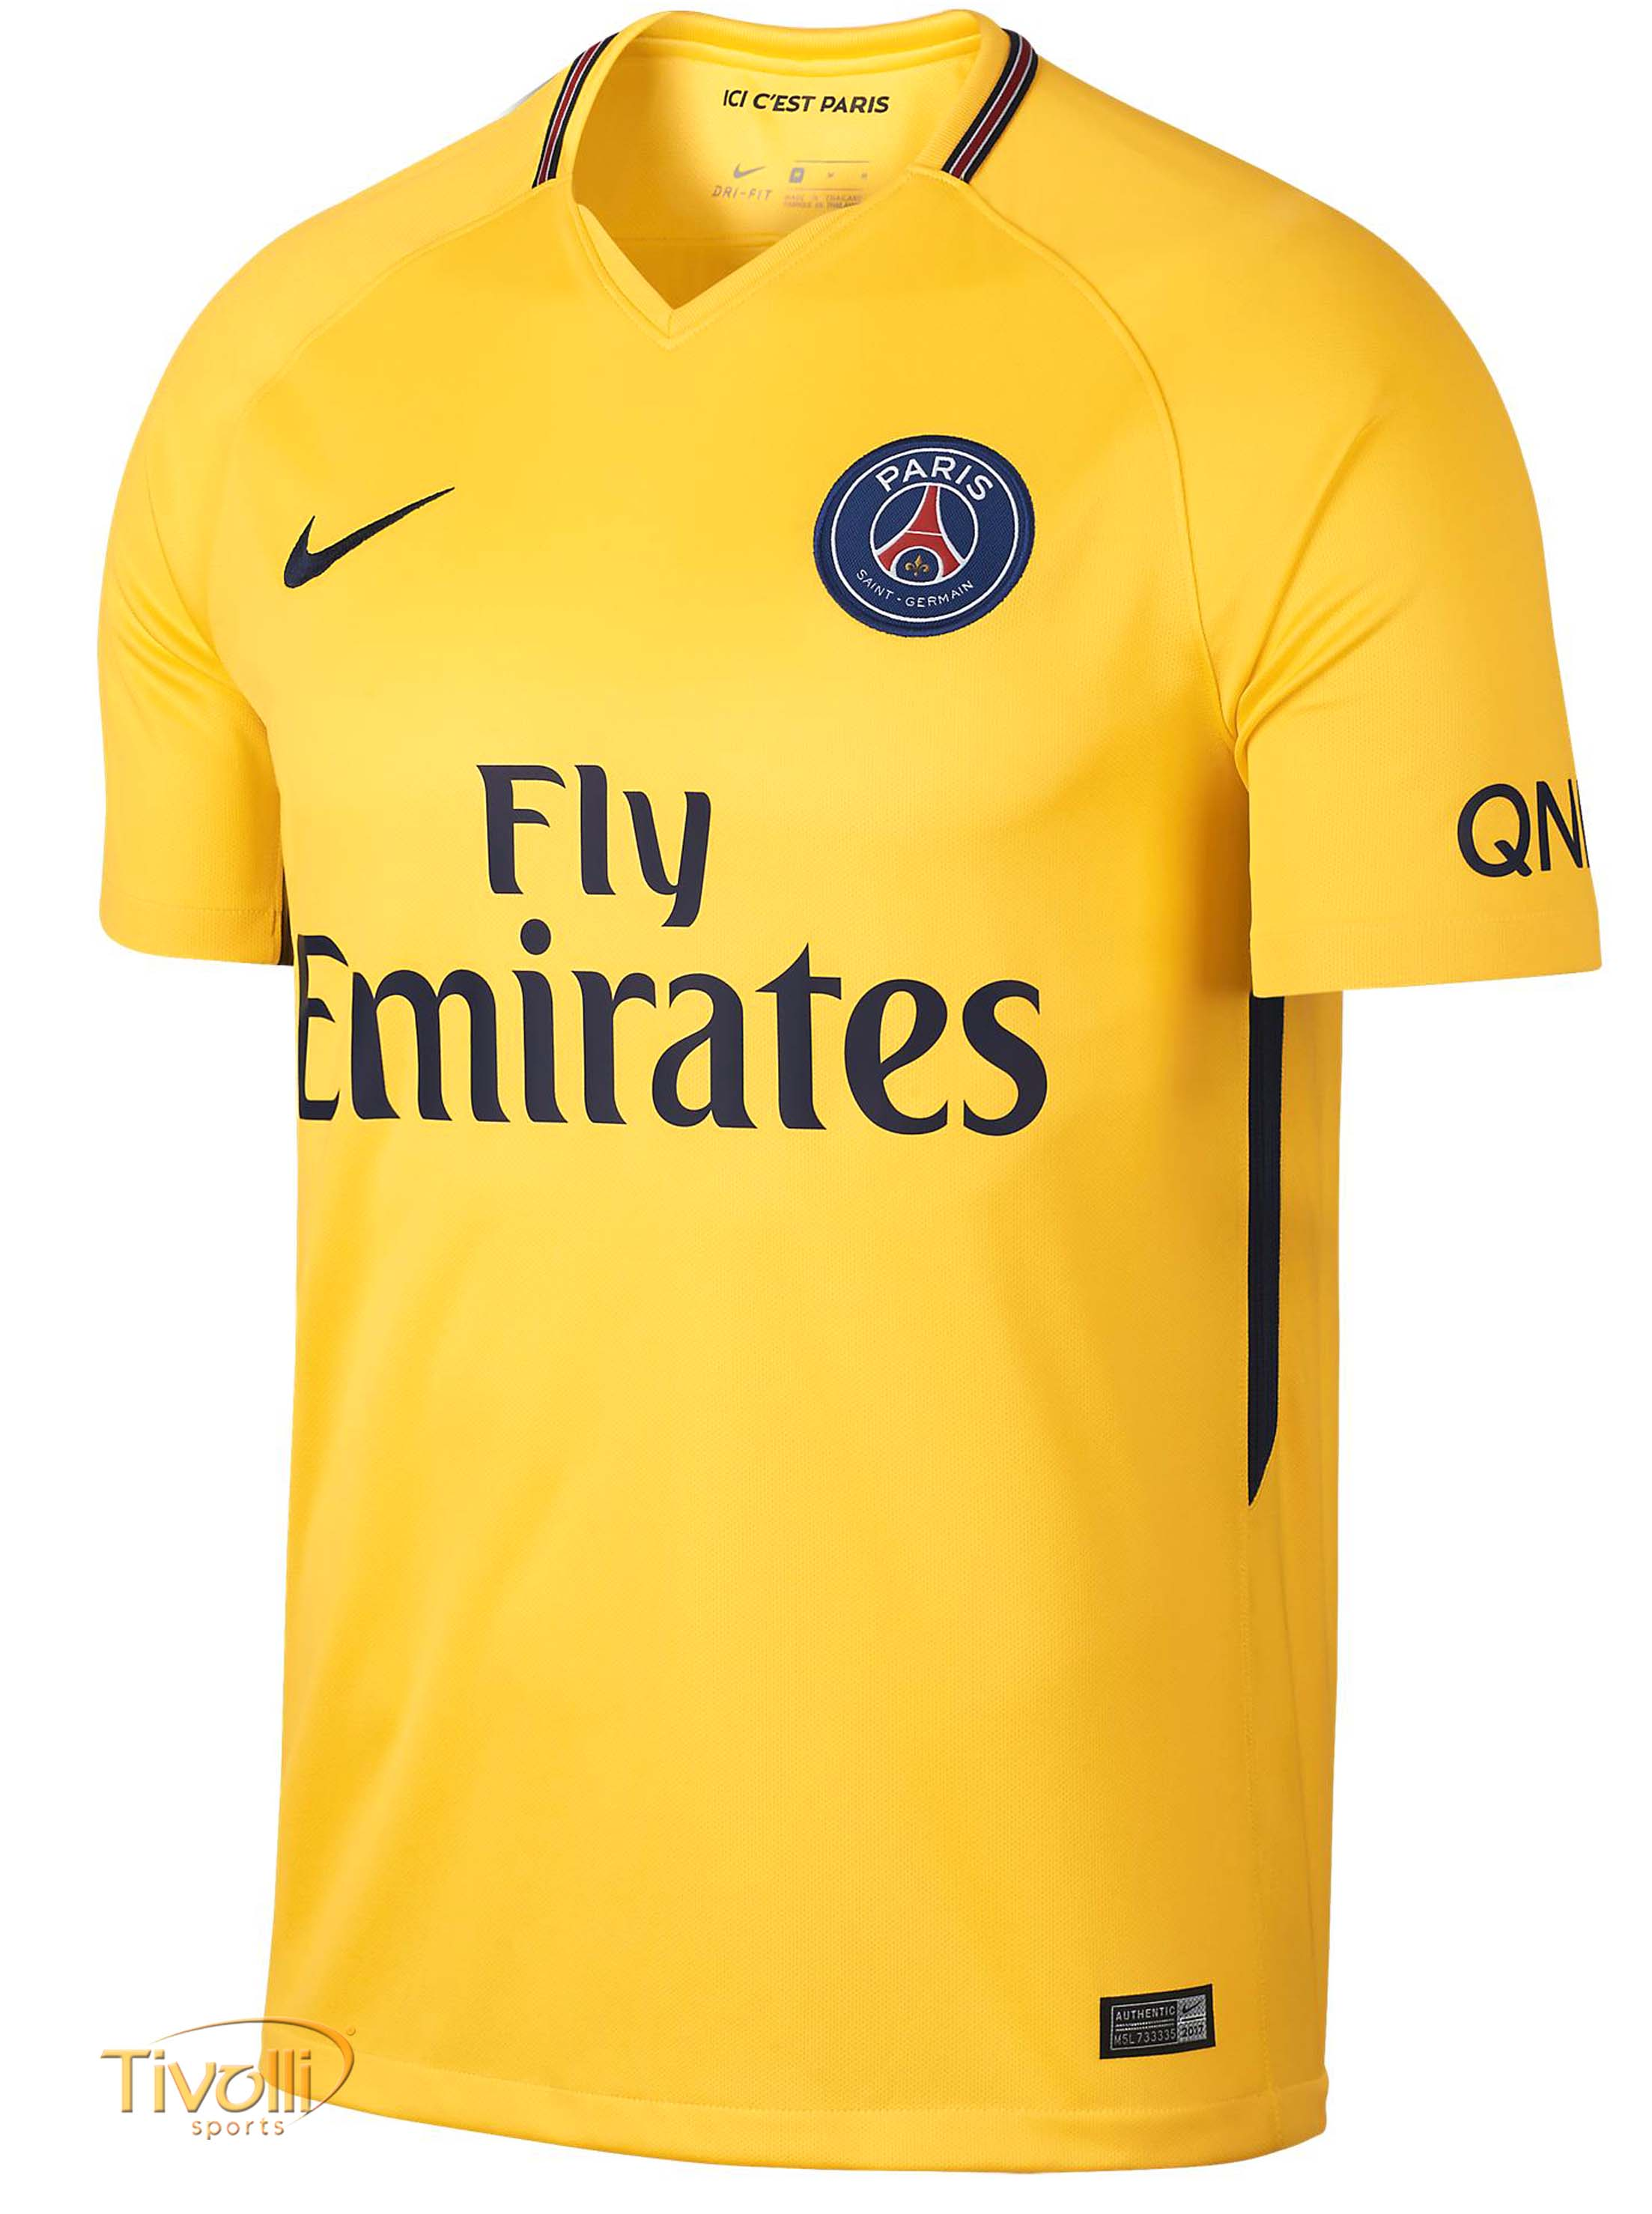 14f3bf0a14 Camisa Paris Saint-Germain PSG 2017 2018 II Away Nike Infantil Amarela